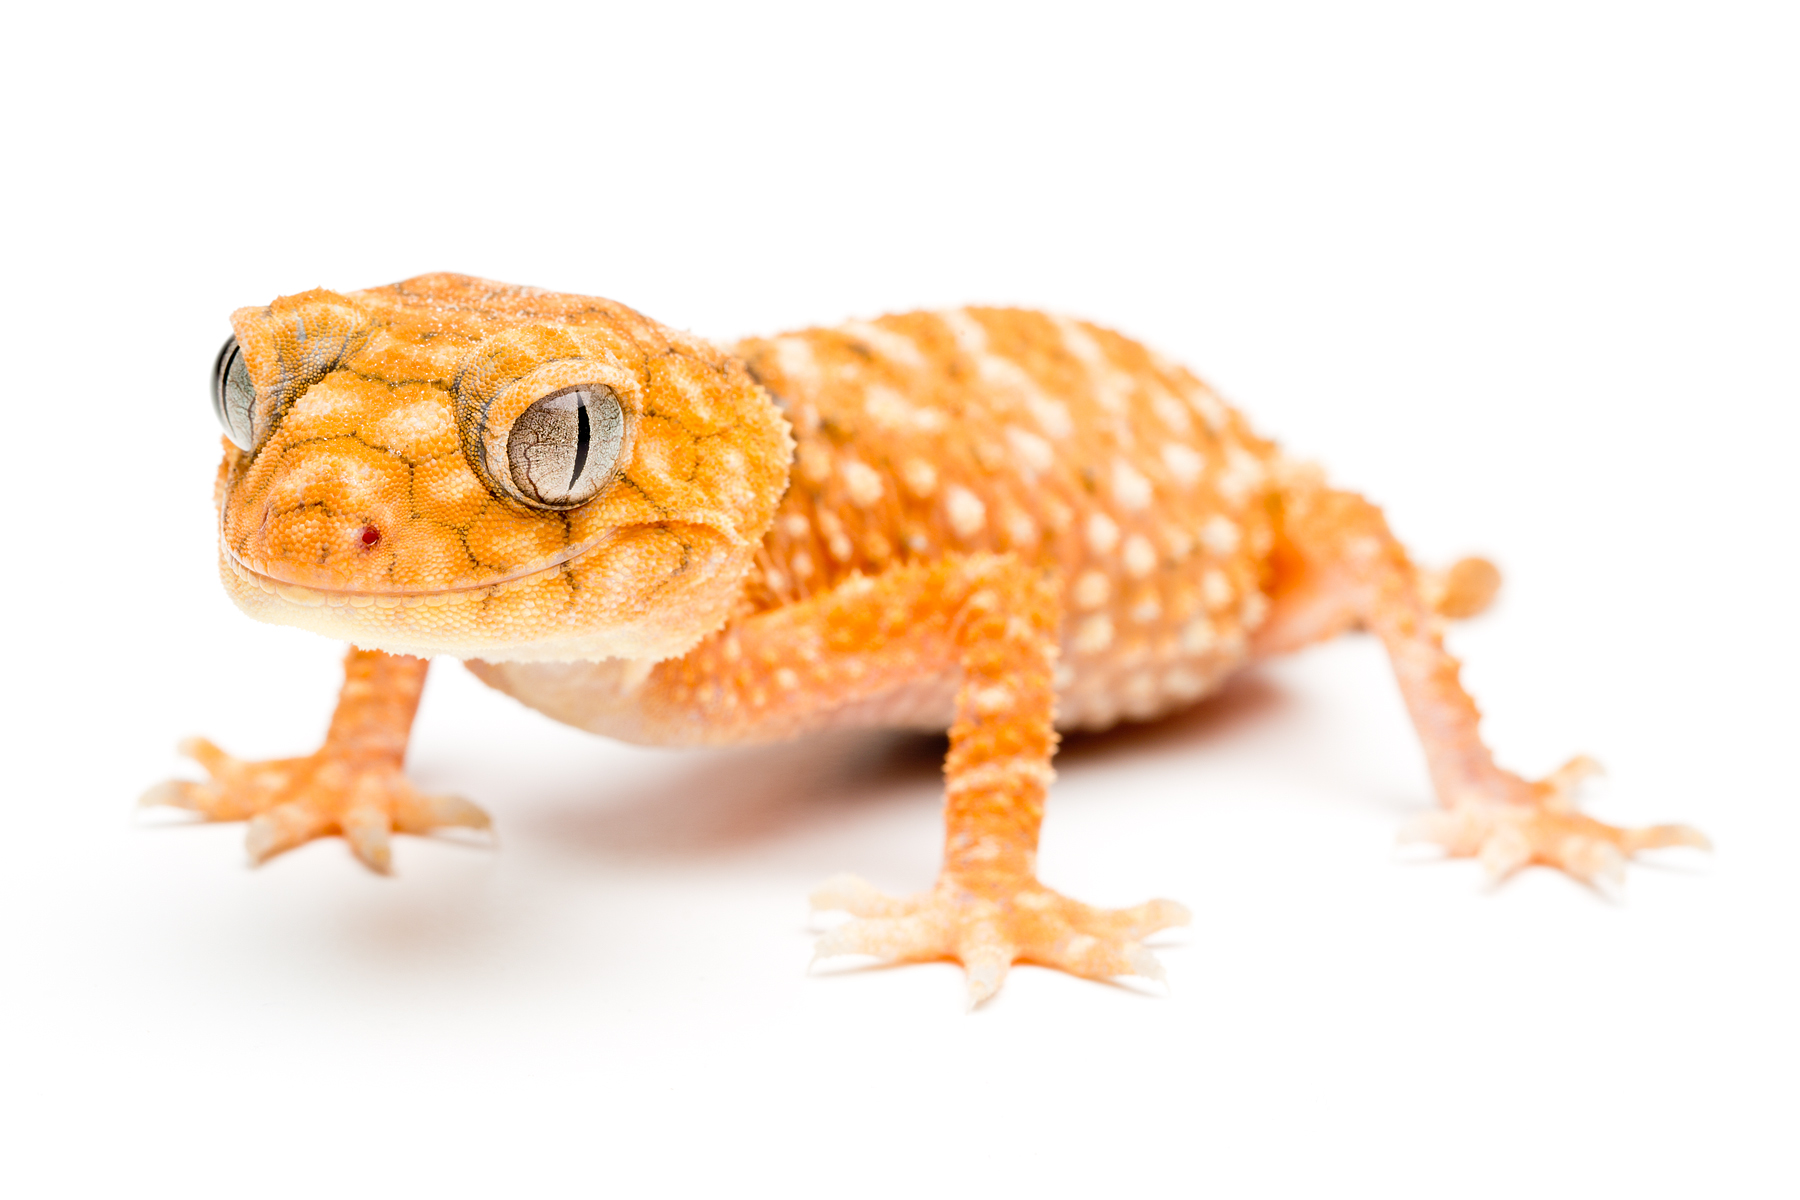 Juvenile Nephrurus amyae